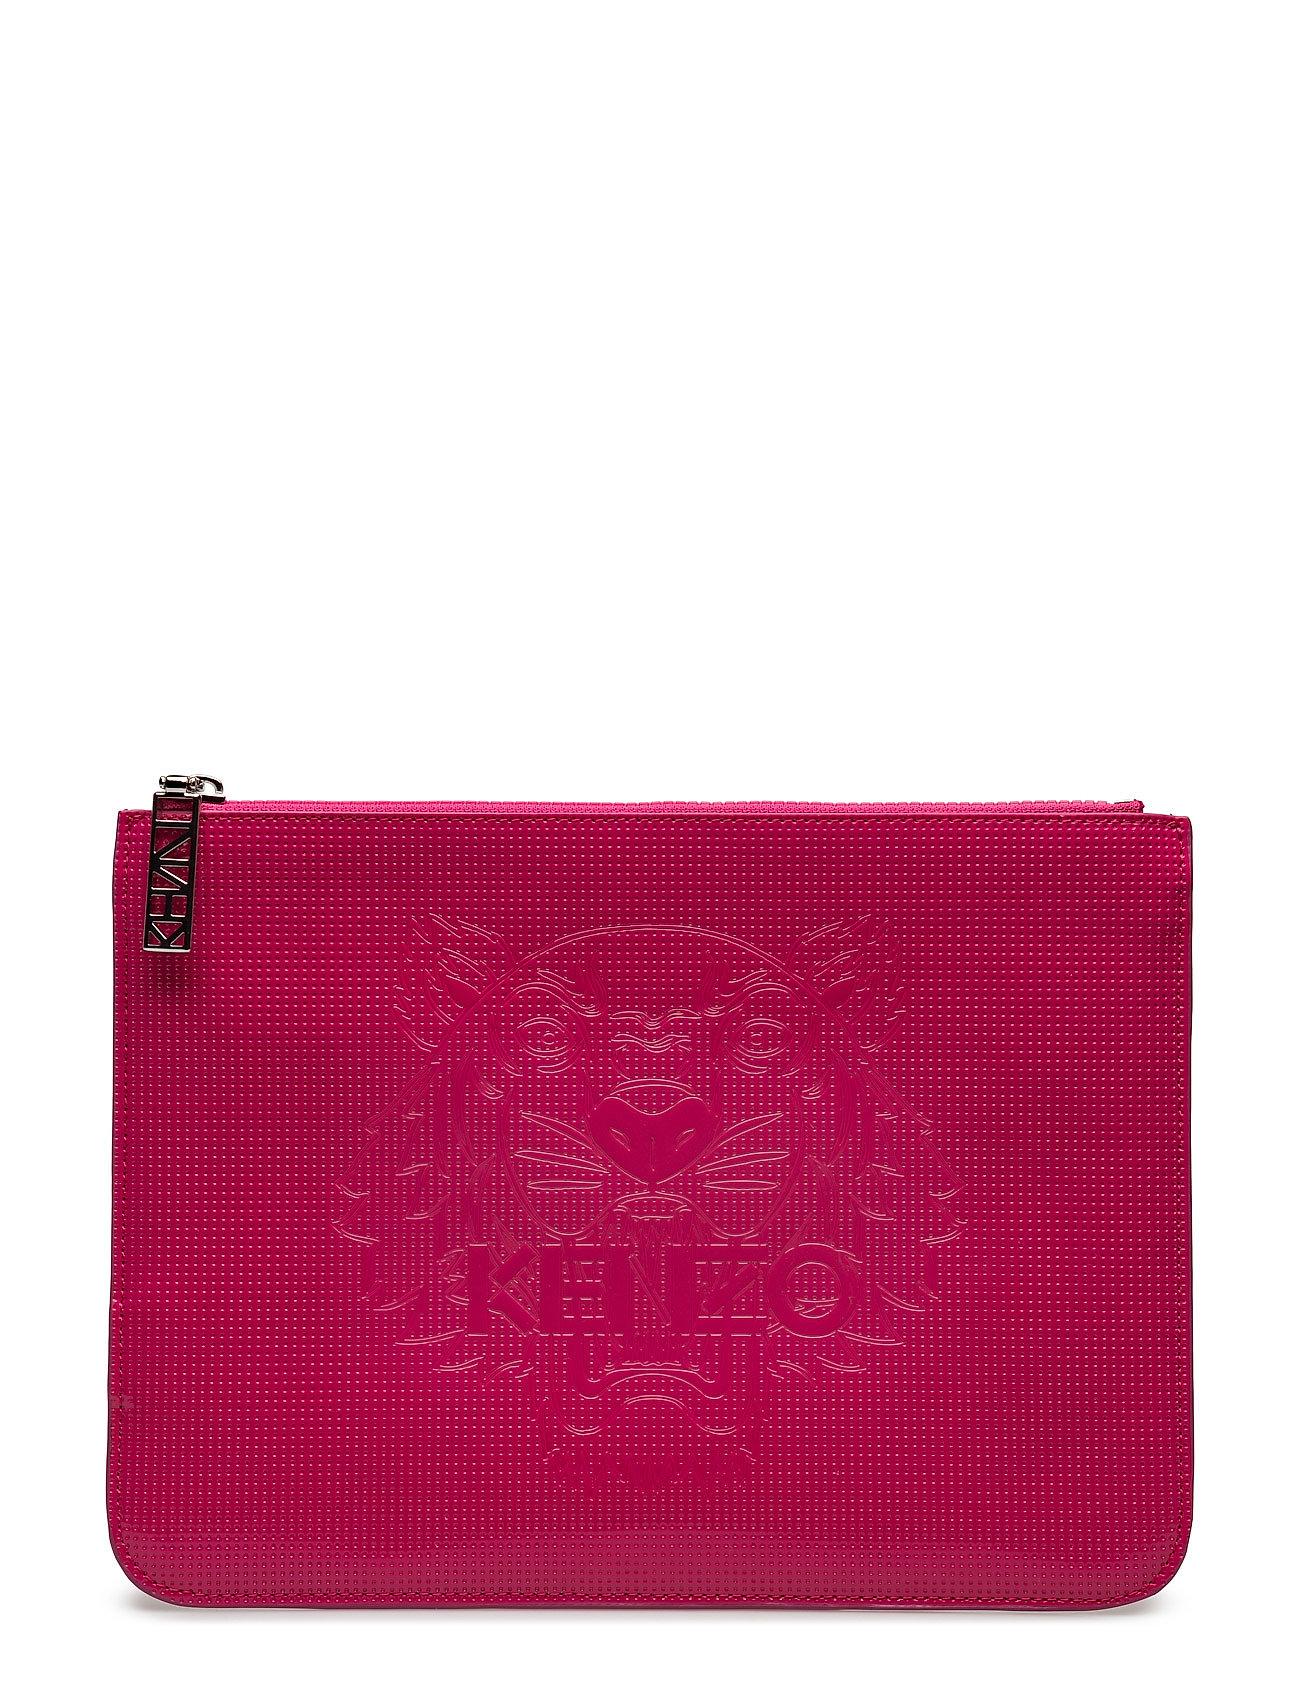 Clutch Bag Main Kenzo Små tasker til Damer i